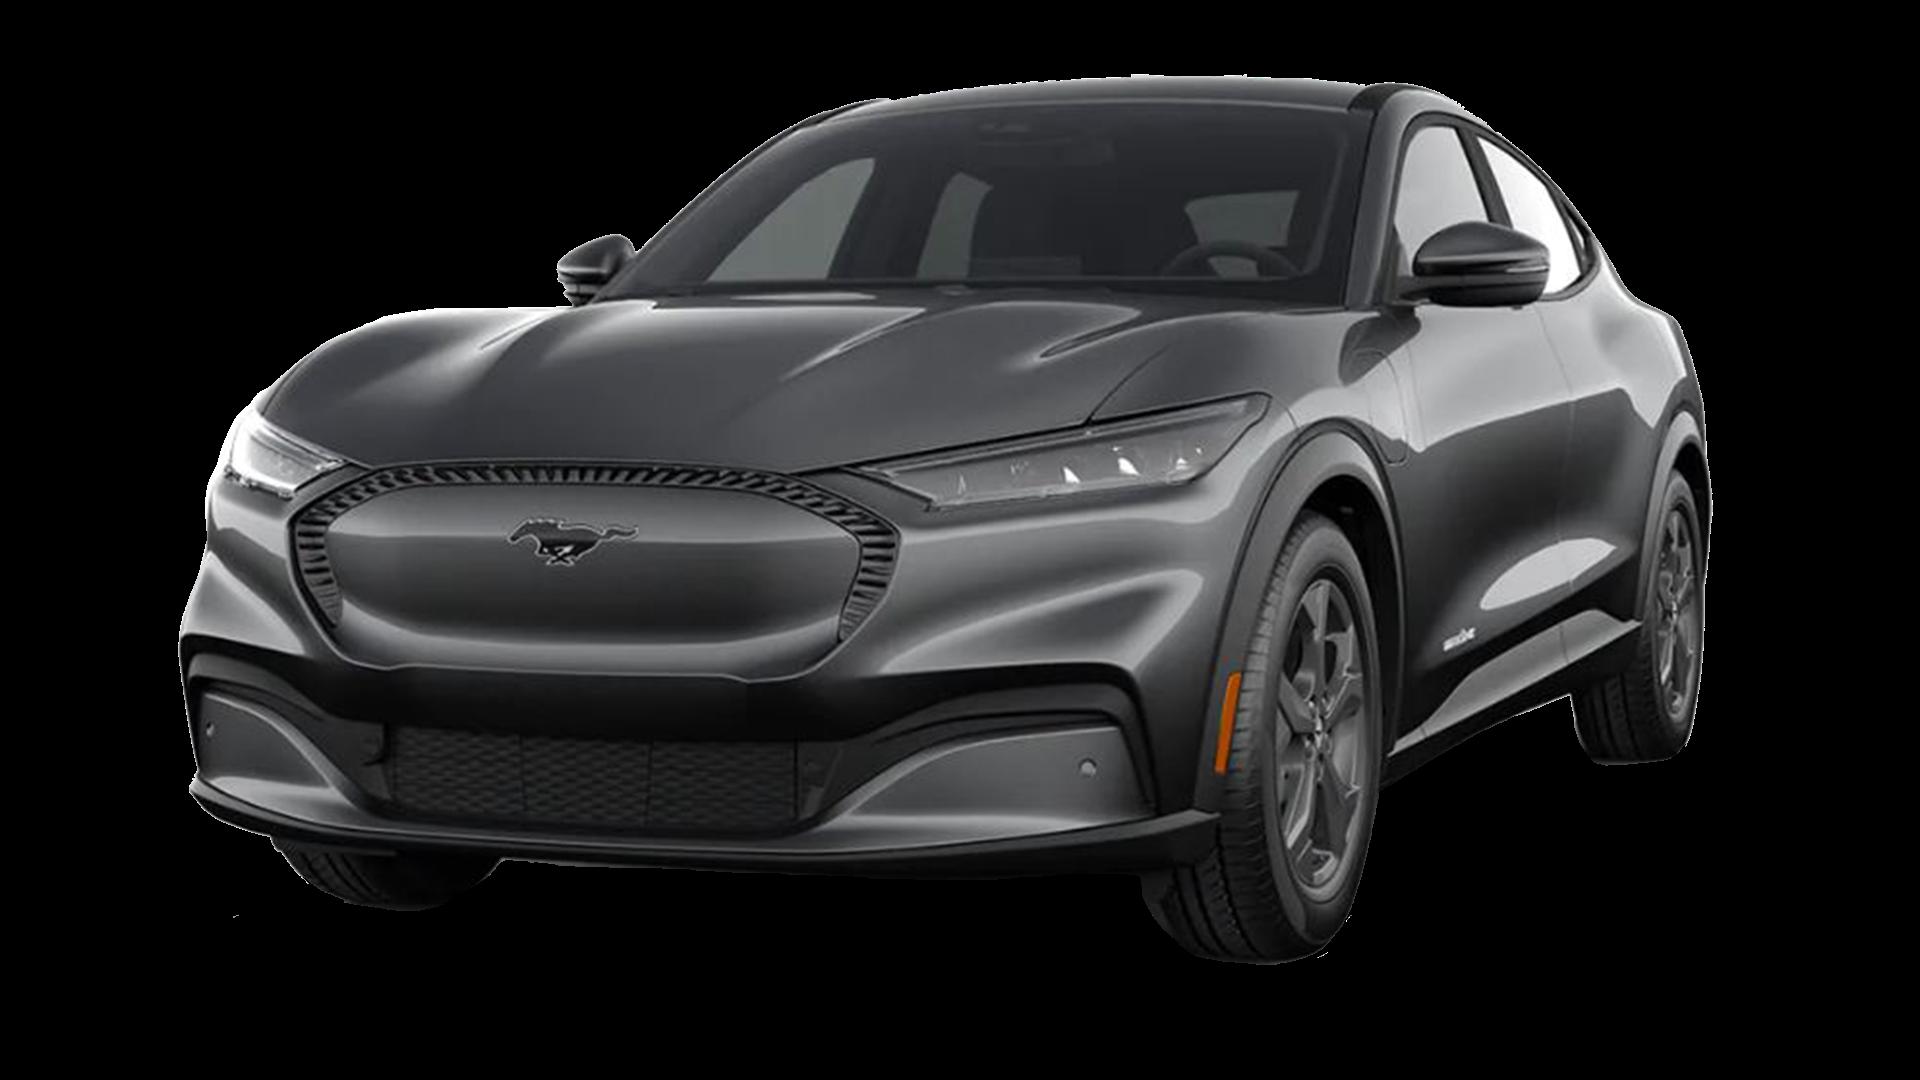 2021 Mustang Mach E Select